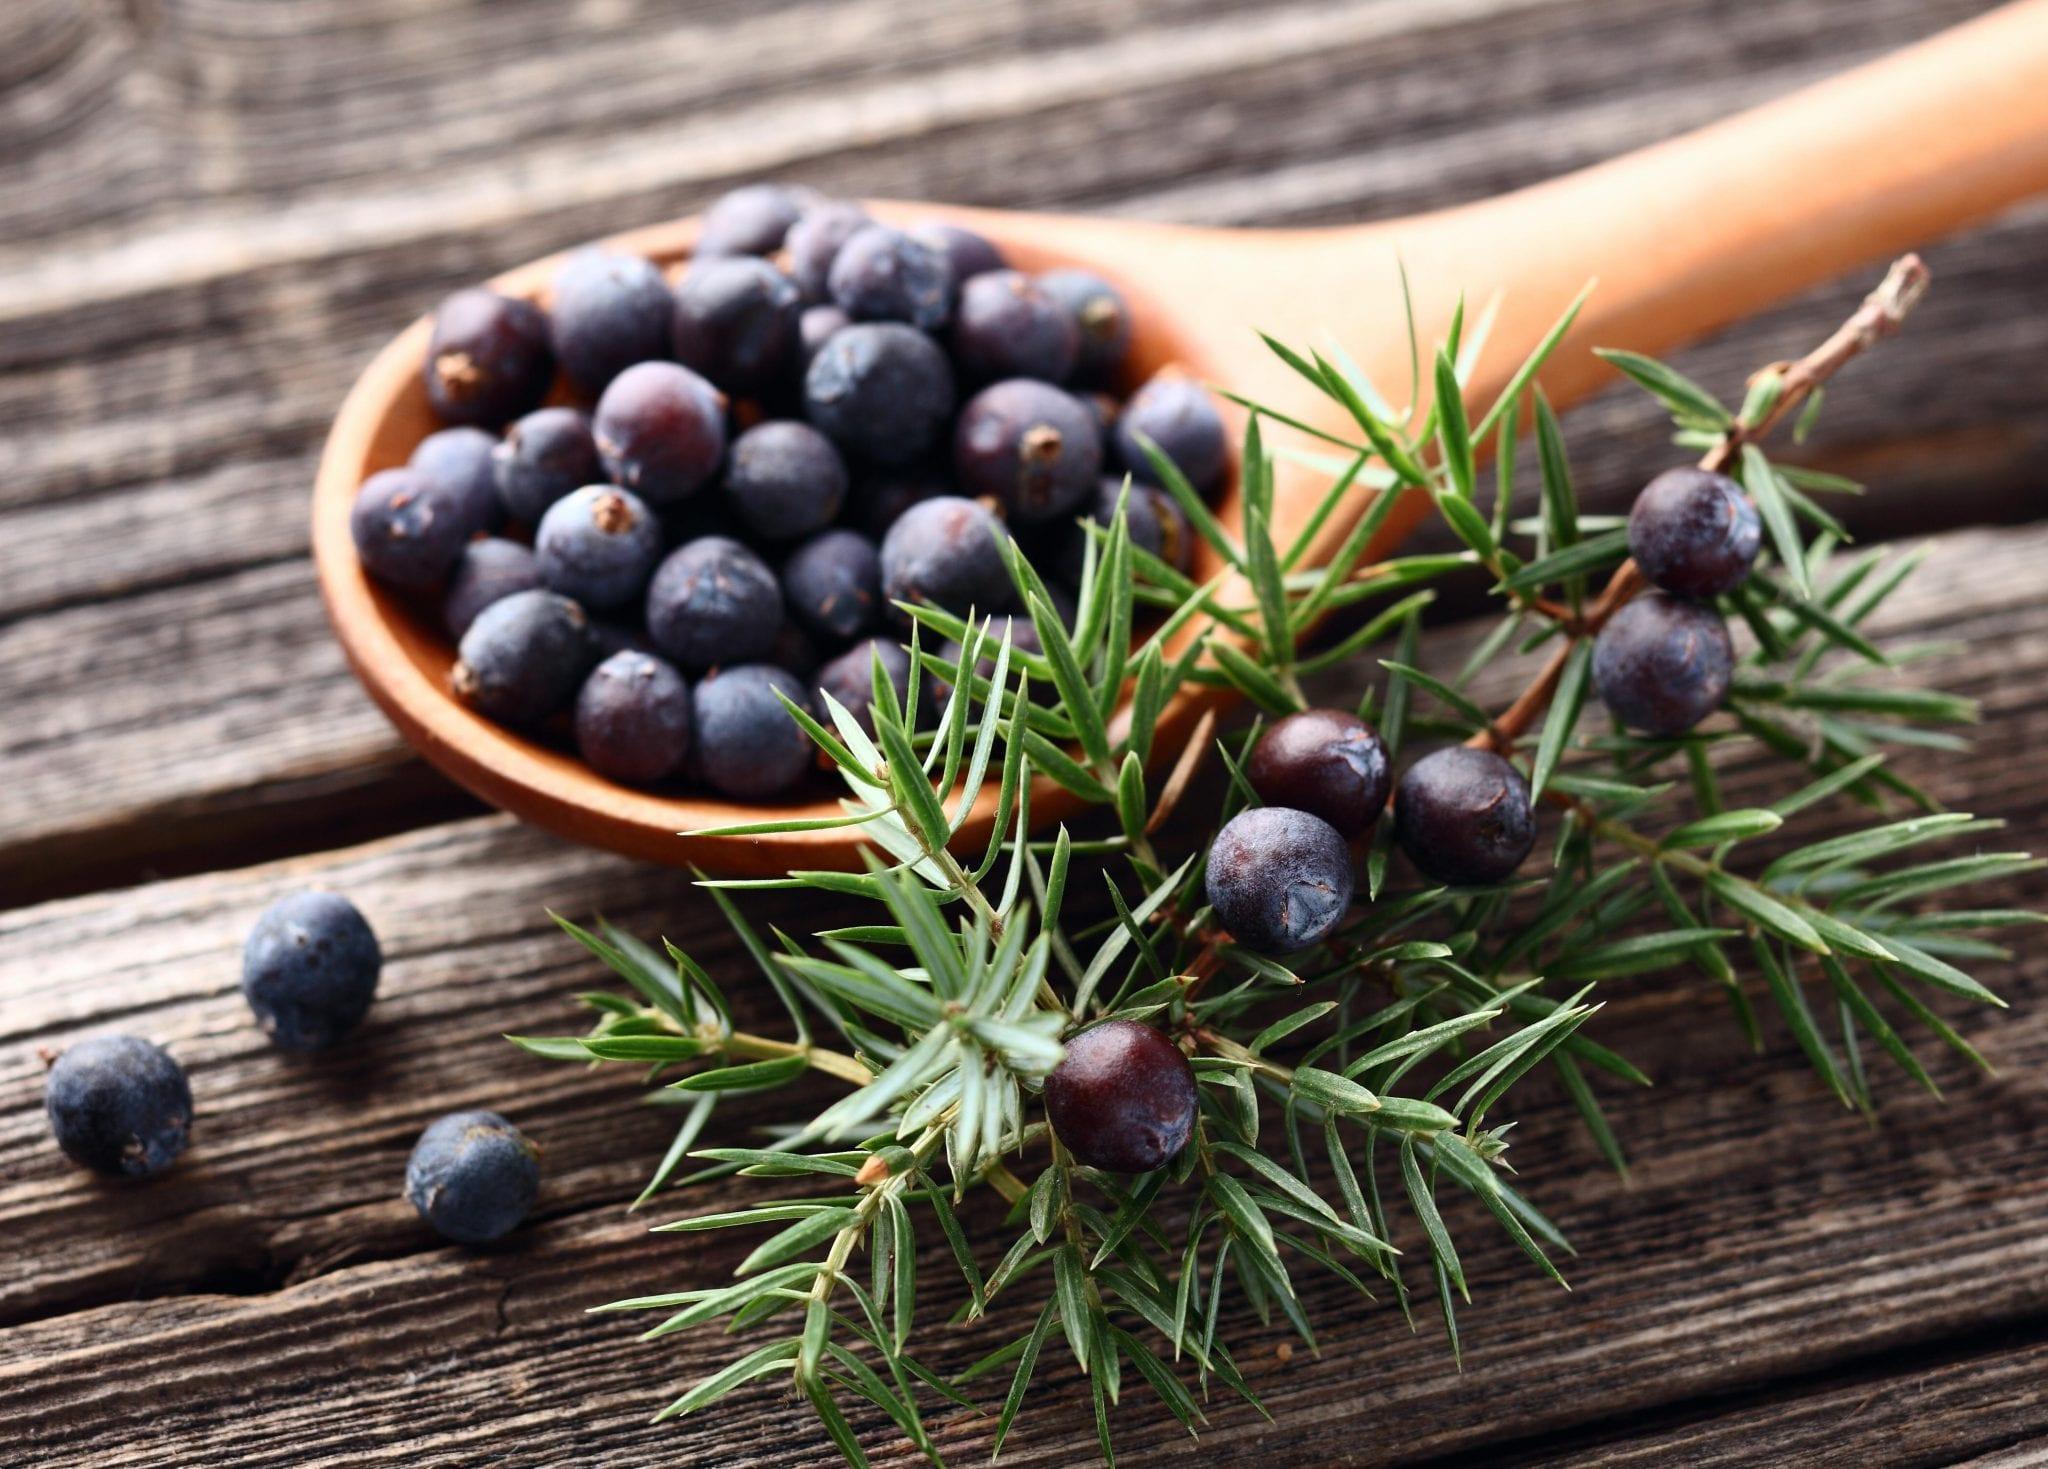 Substitute for Juniper Berries